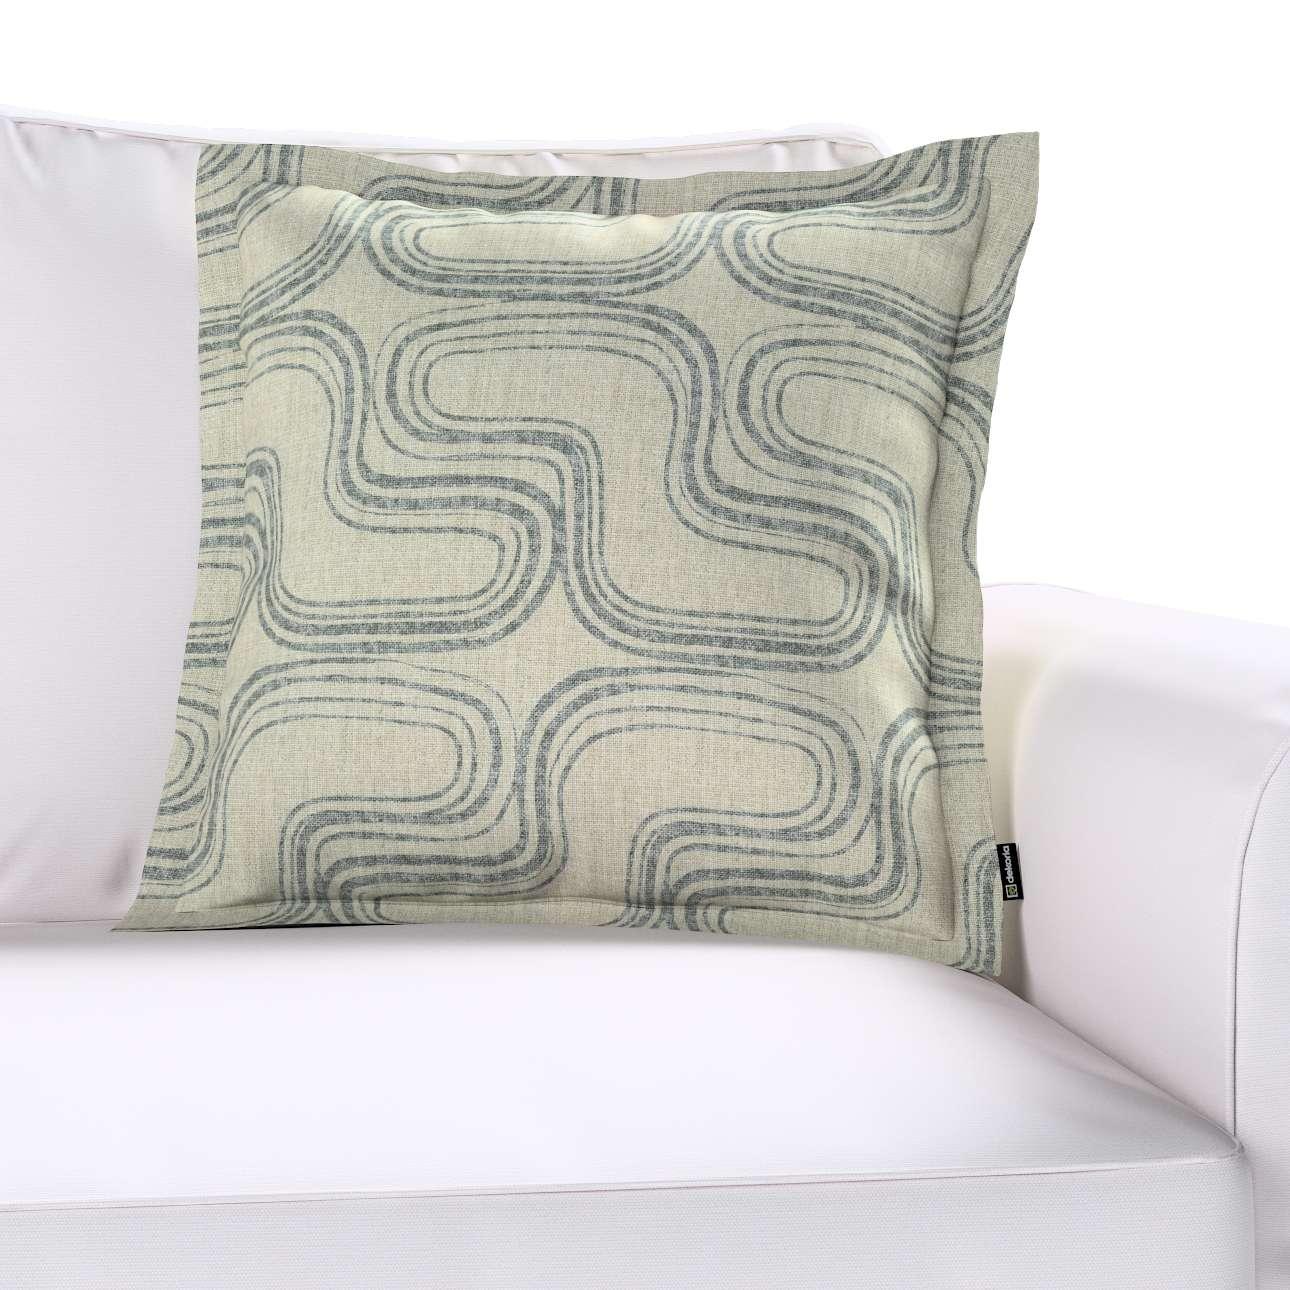 Poszewka Mona na poduszkę w kolekcji Comics, tkanina: 143-14